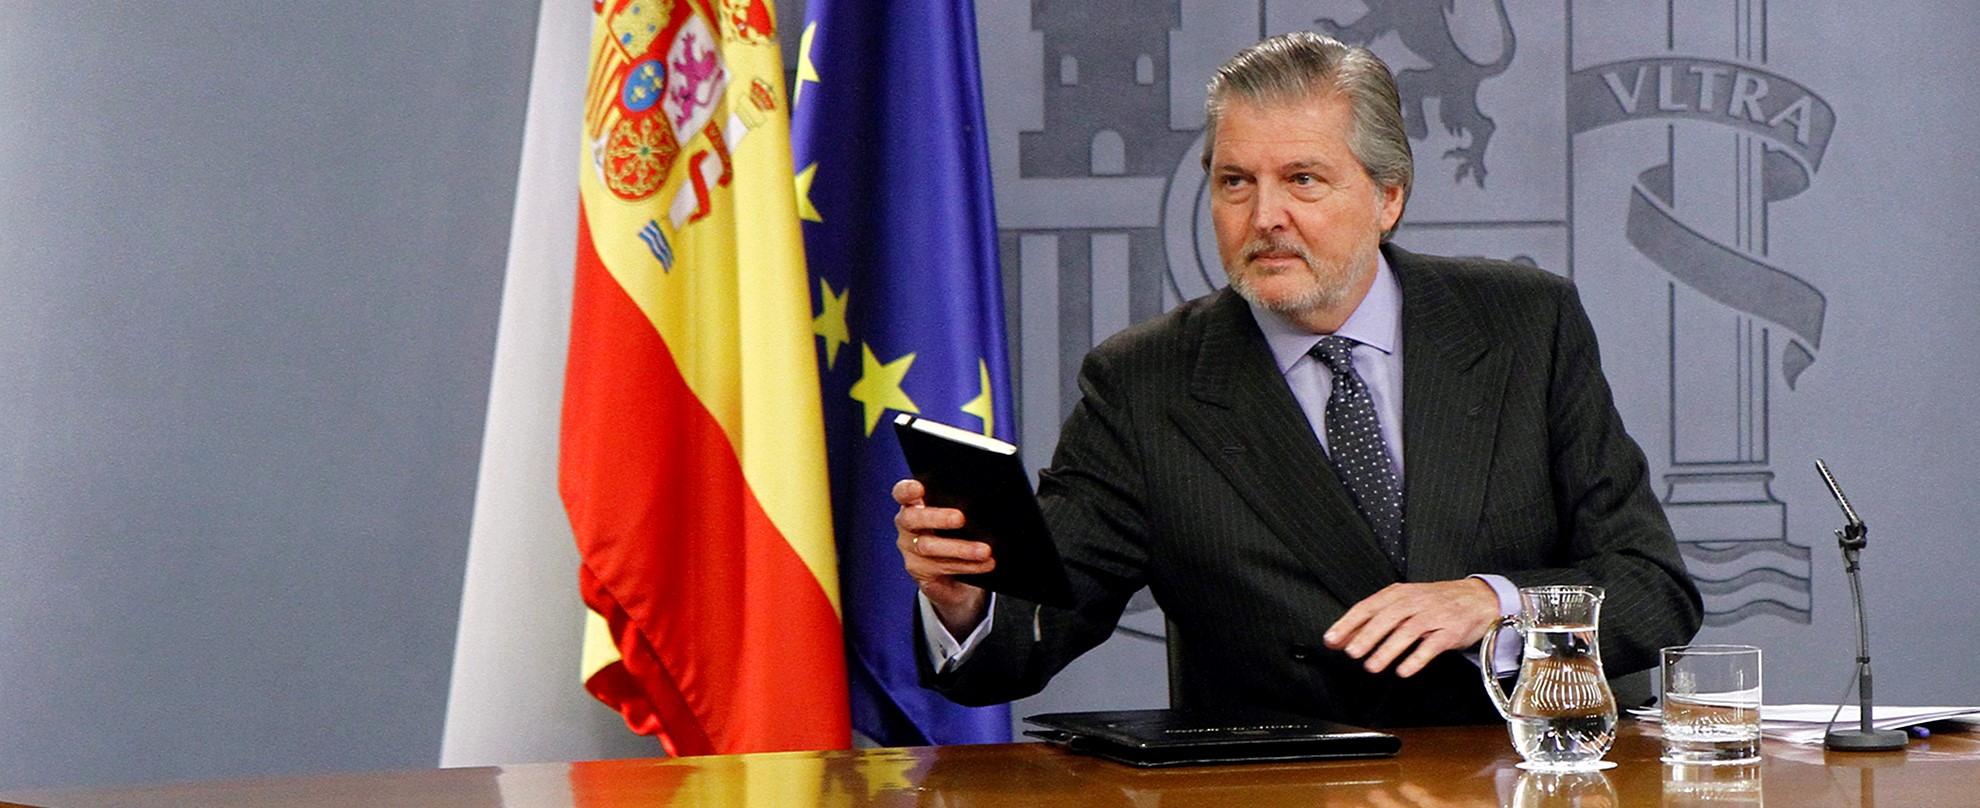 09122016_consejoministros3-2